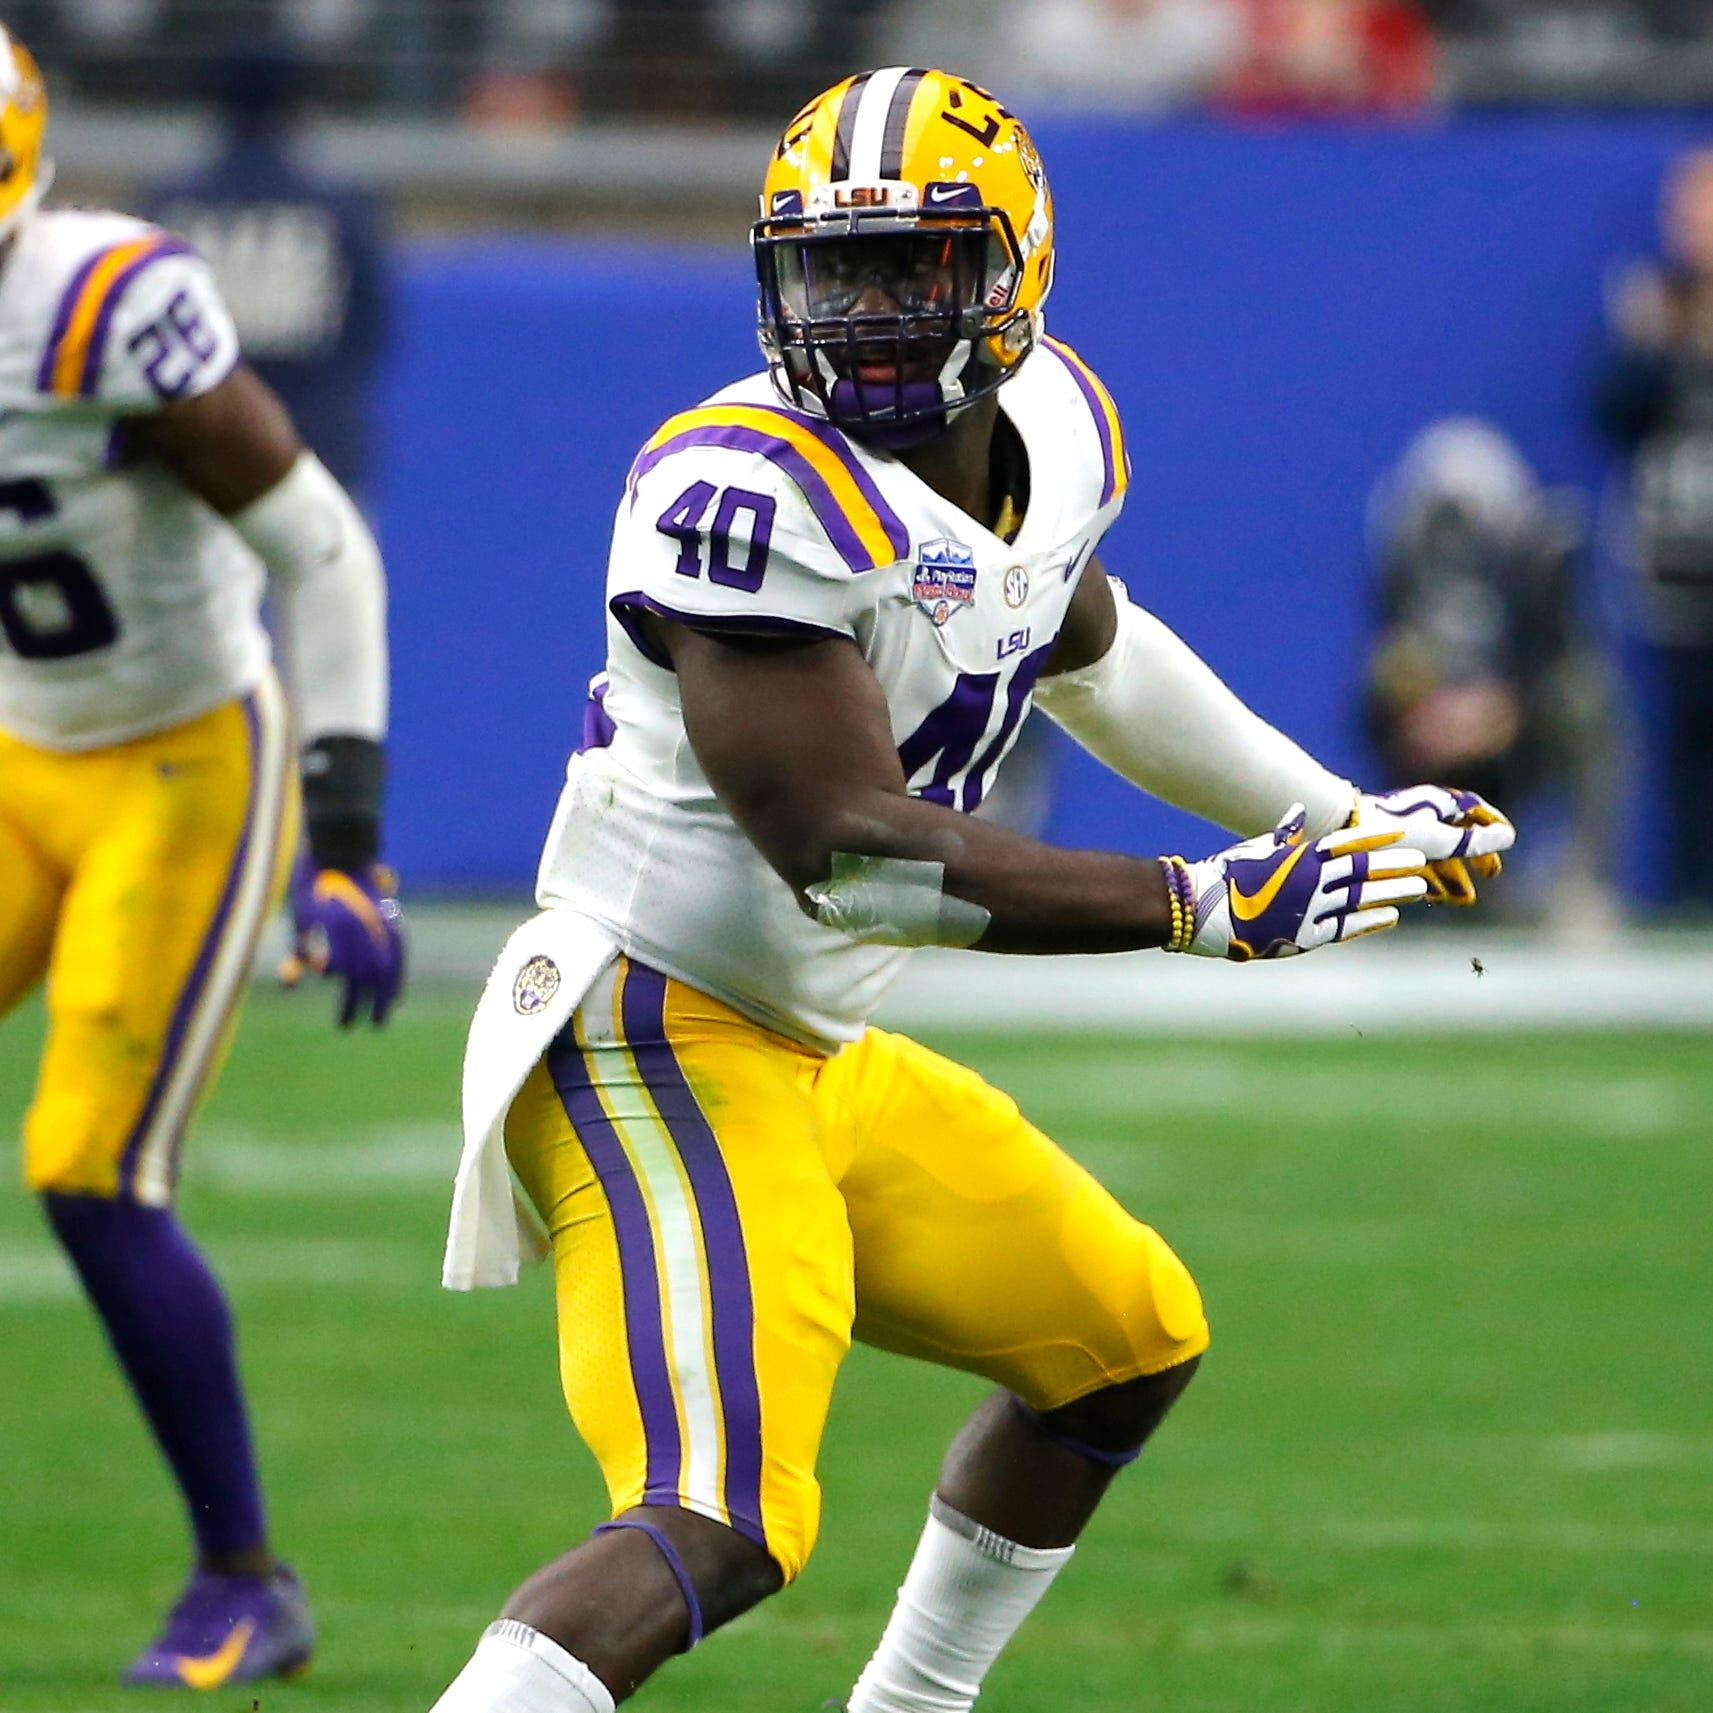 Lions 2019 draft preview: Starters return, but Detroit lacks depth at linebacker